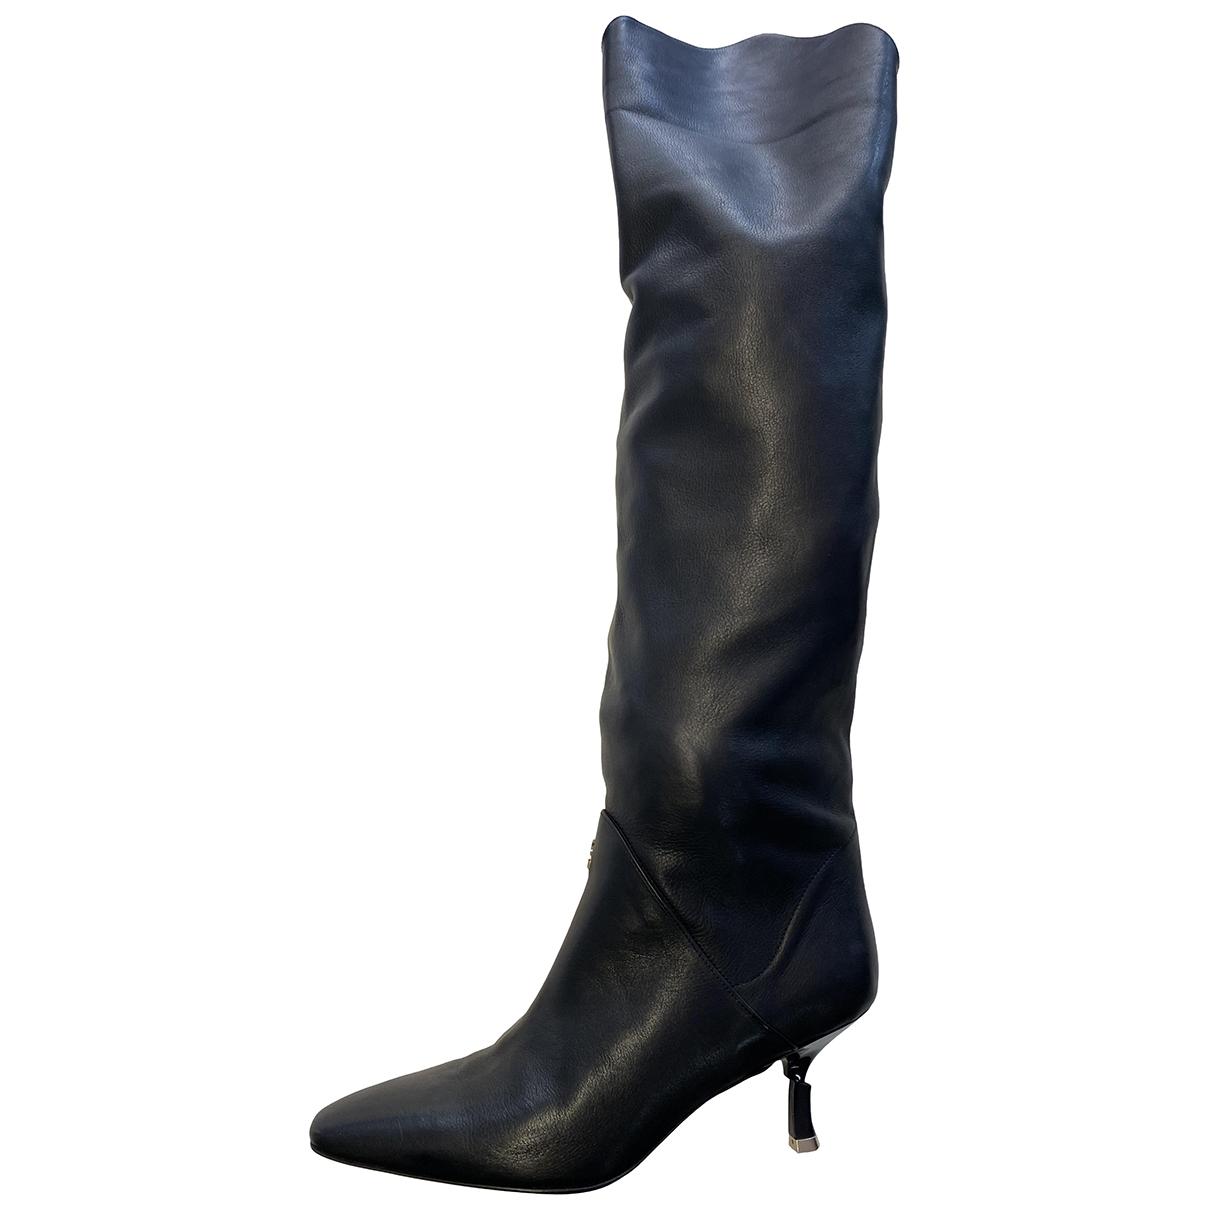 Patrizia Pepe \N Black Leather Boots for Women 38 EU